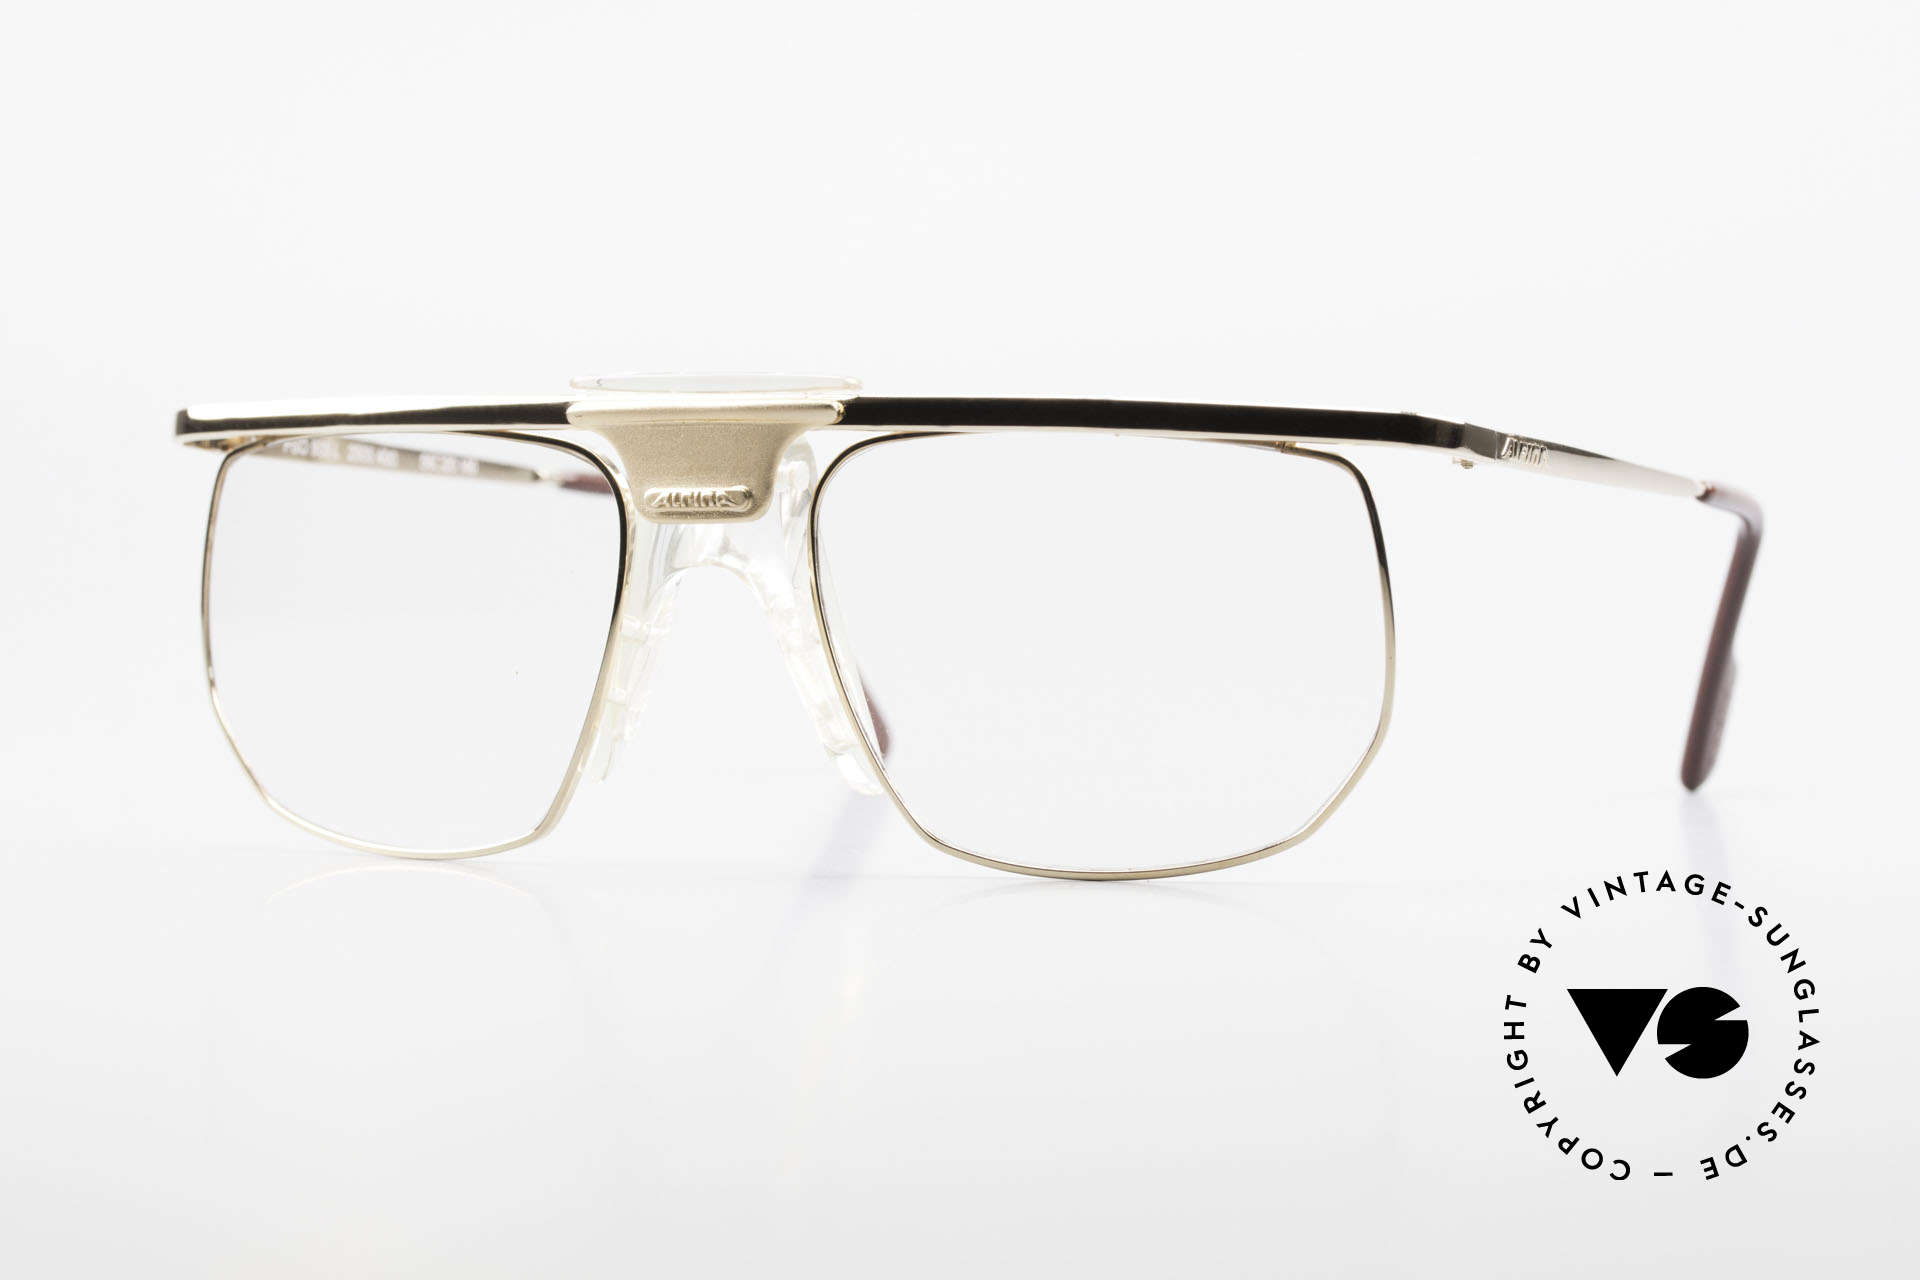 Alpina PSO 905 Vintage Glasses Saddle Bridge, the nose pad looks like a saddle; truly unique!, Made for Men